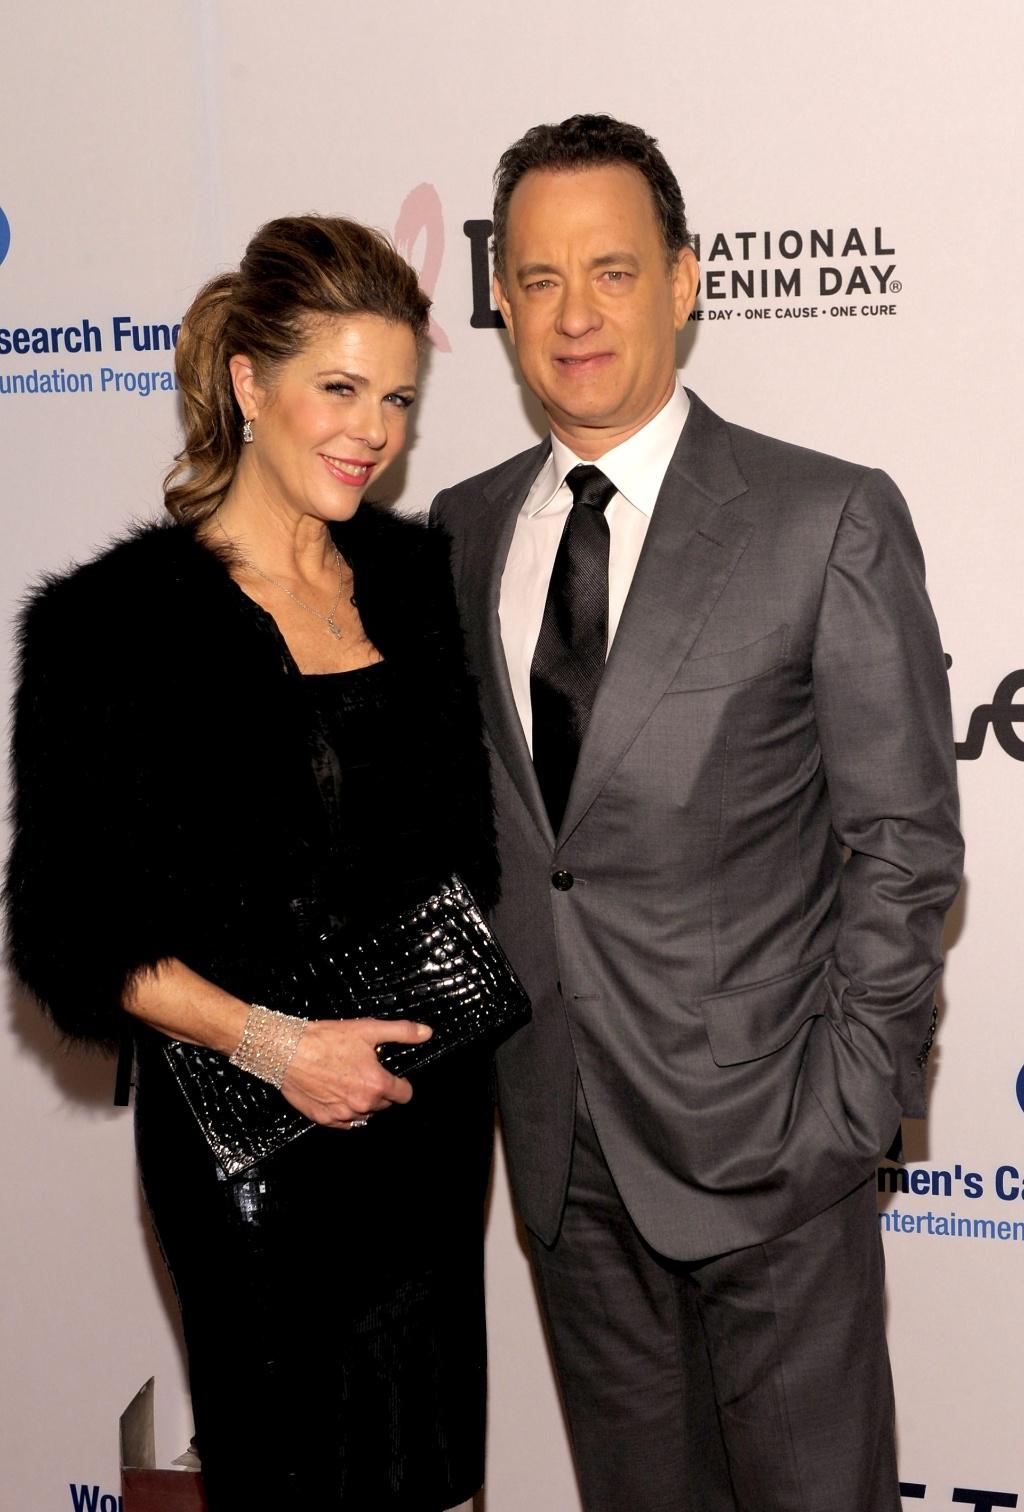 Tom Hanks e a esposa Rita Wilson durante evento beneficiente na Califórnia (27/03/2010)